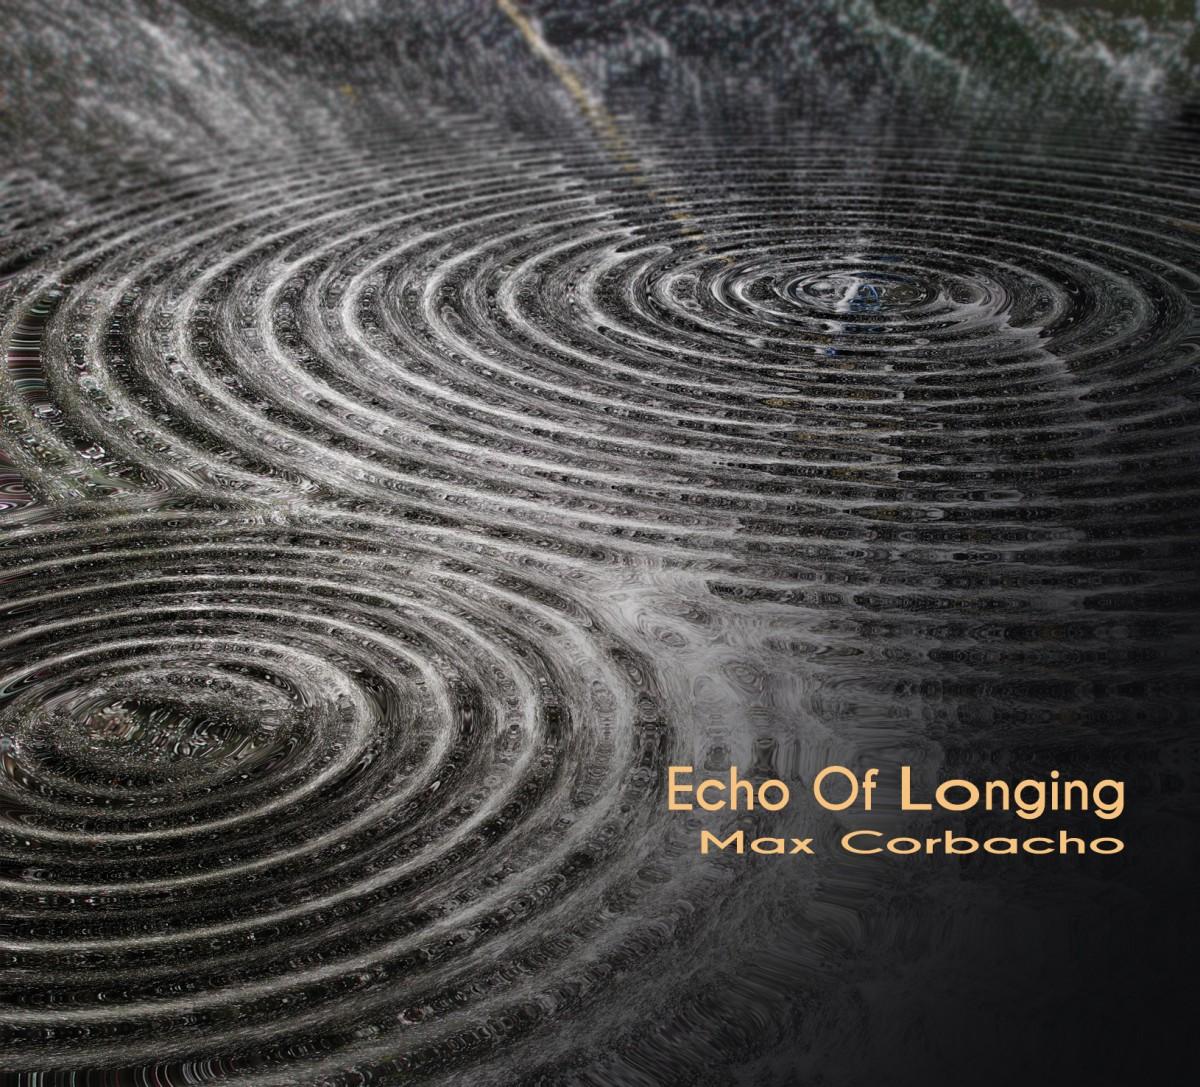 Echo Of Longing - Max Corbacho